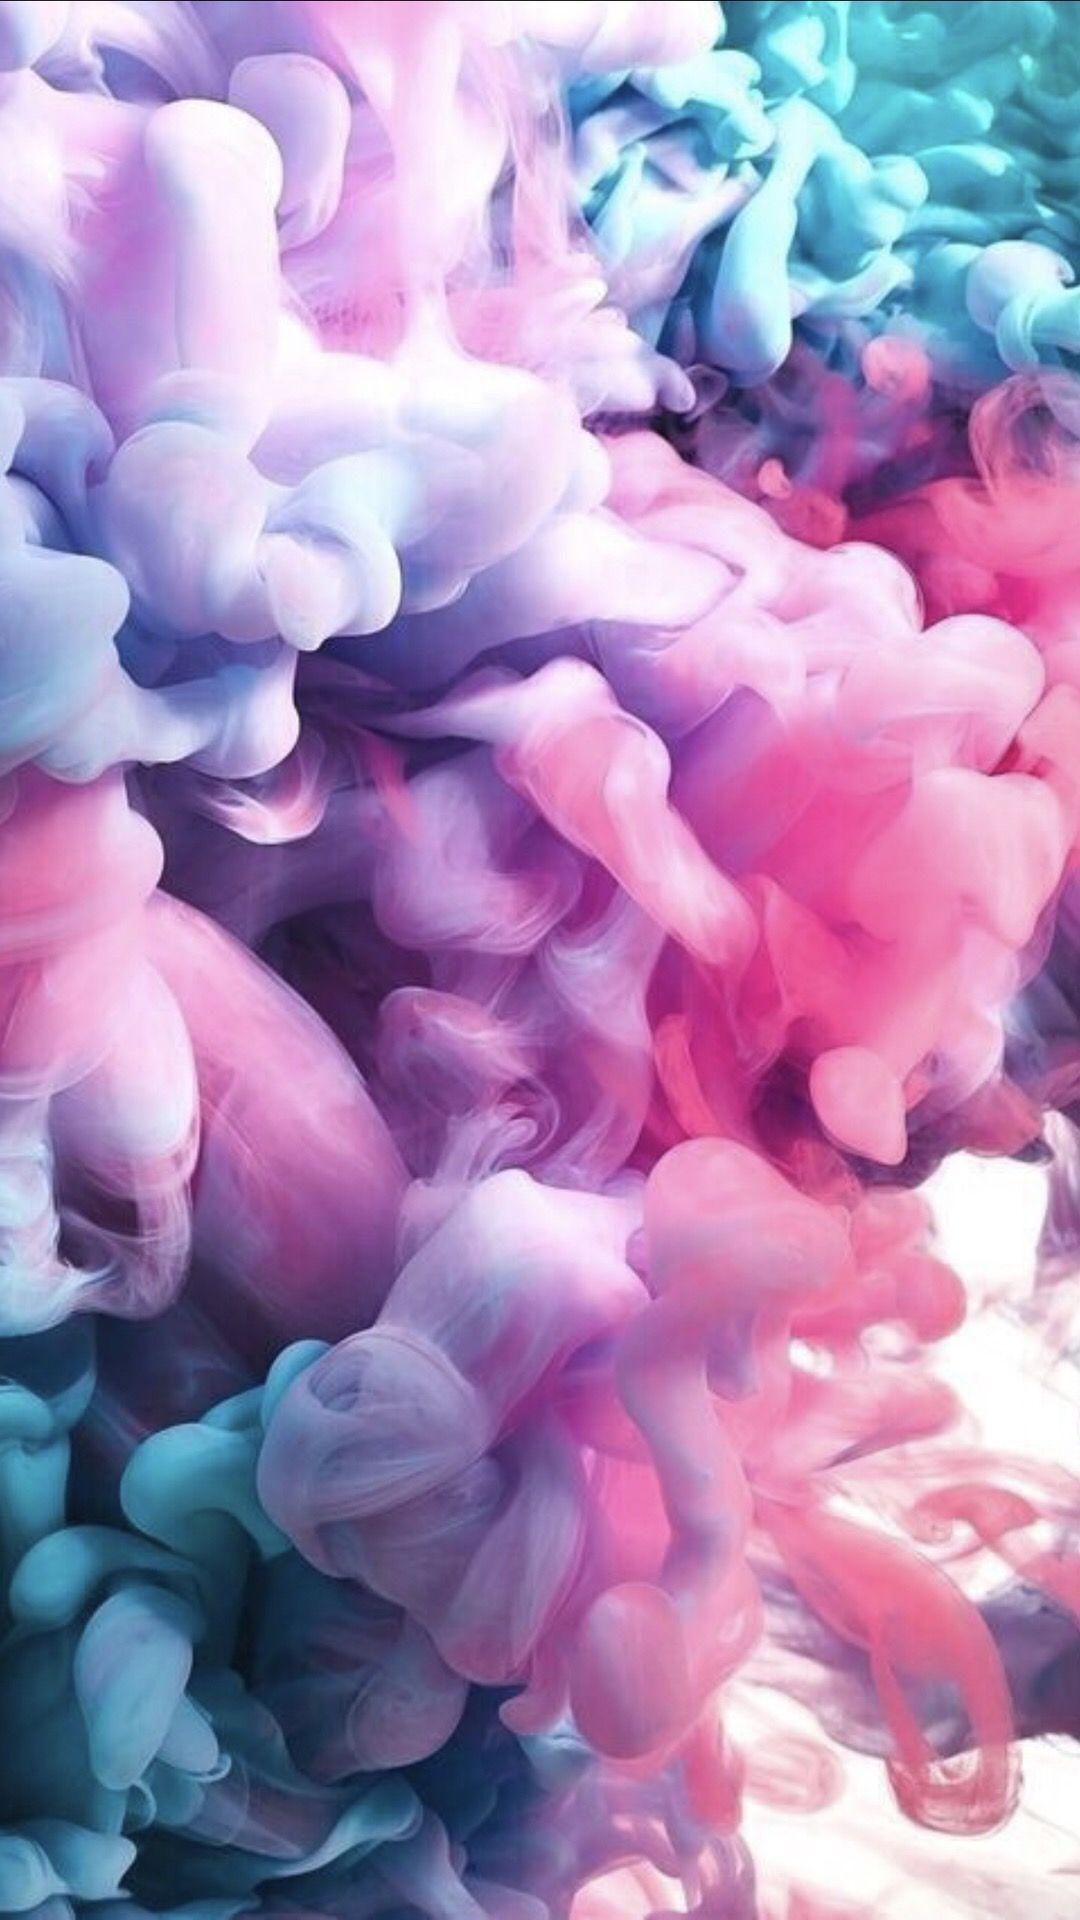 Smoke Trippy Aesthetic : smoke, trippy, aesthetic, Aesthetic, Smoke, Wallpapers, WallpaperDog